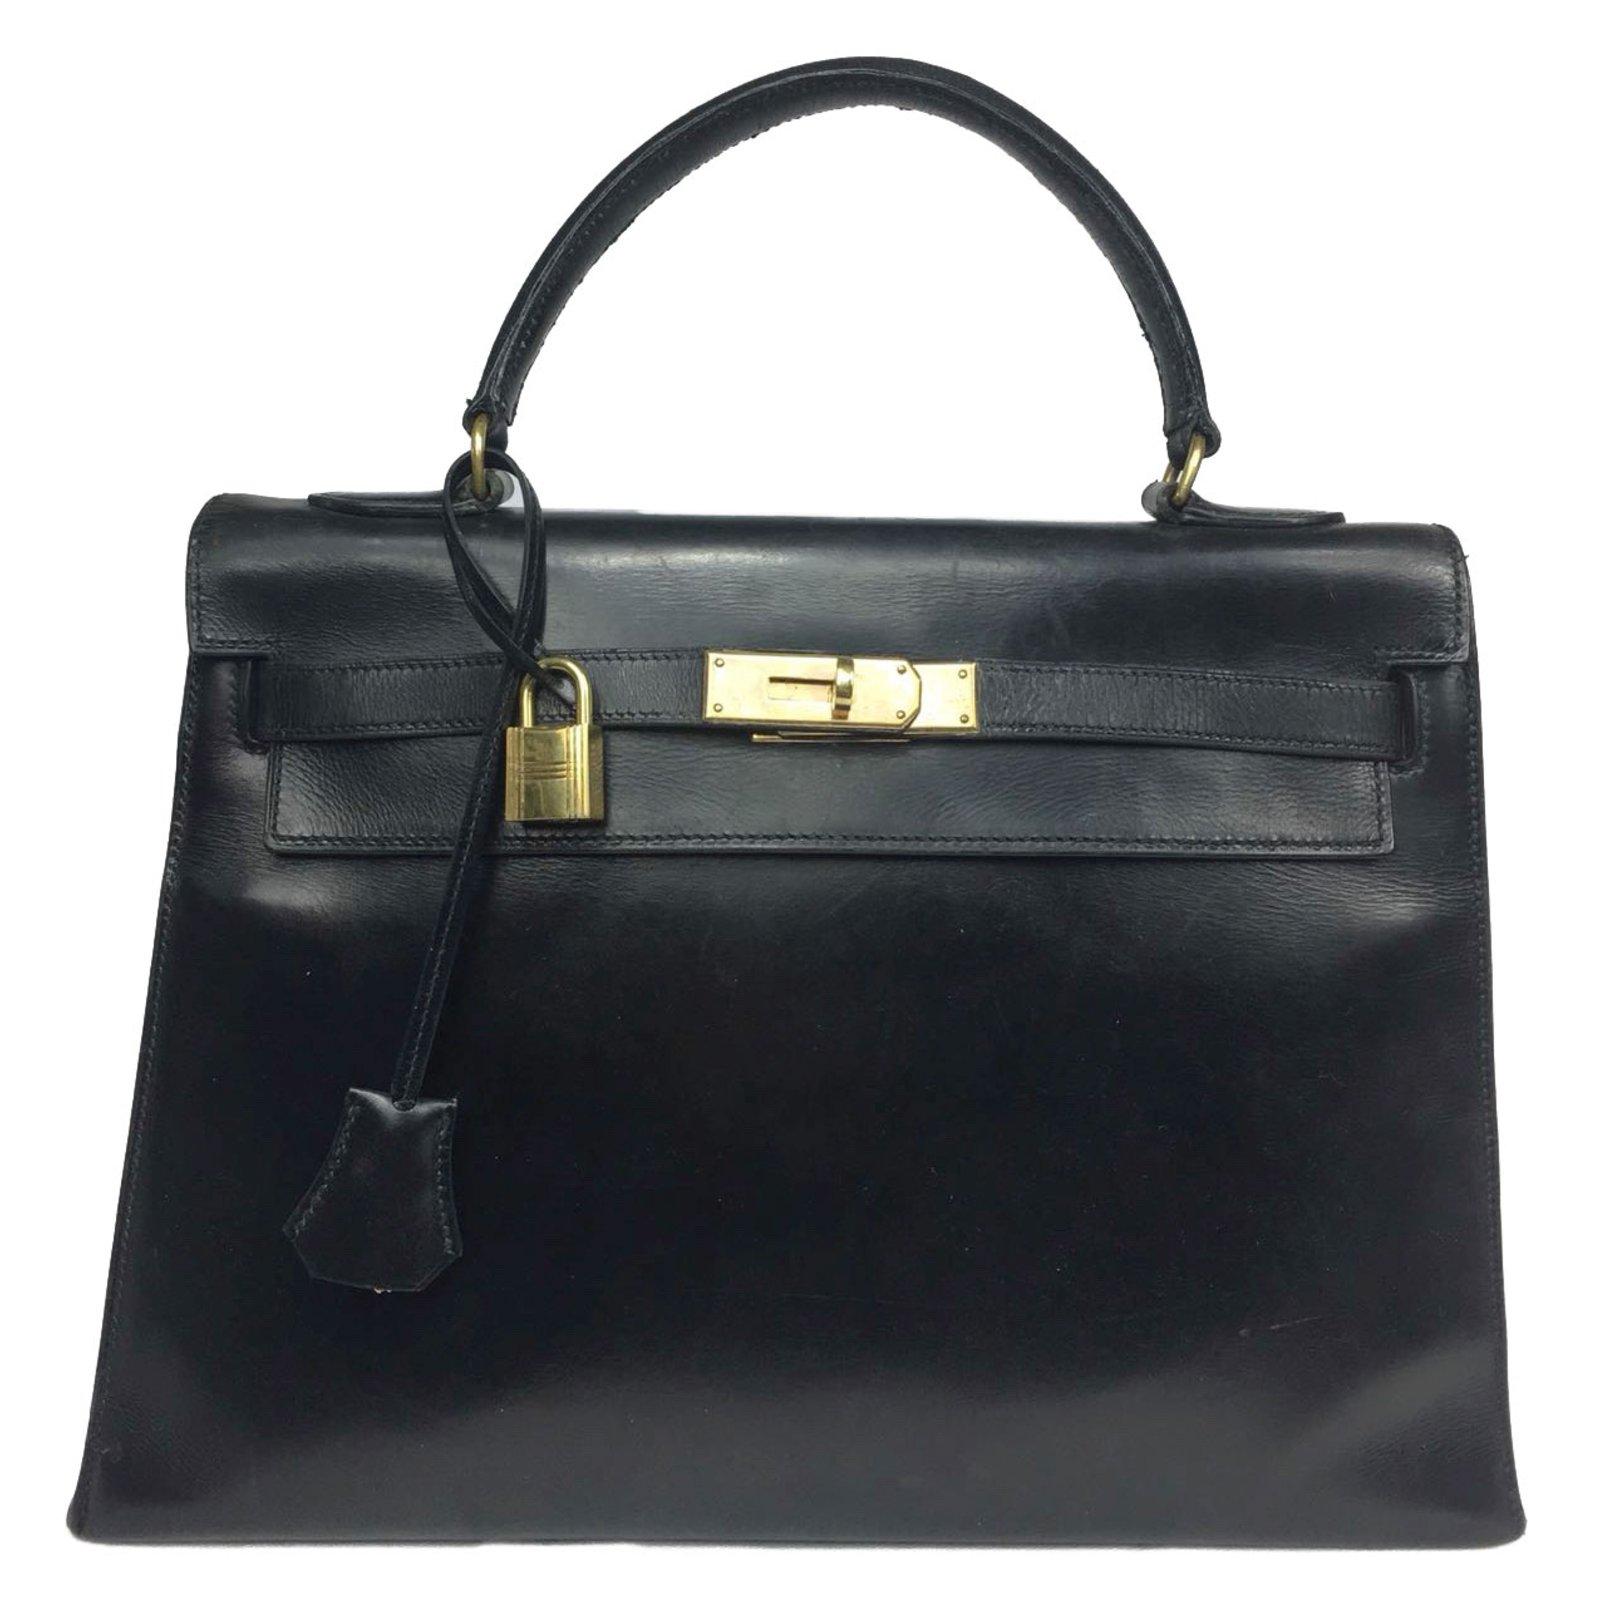 1524cfa604 Hermès Kelly sellier 32 vintage Handbags Leather Black ref.58488 ...